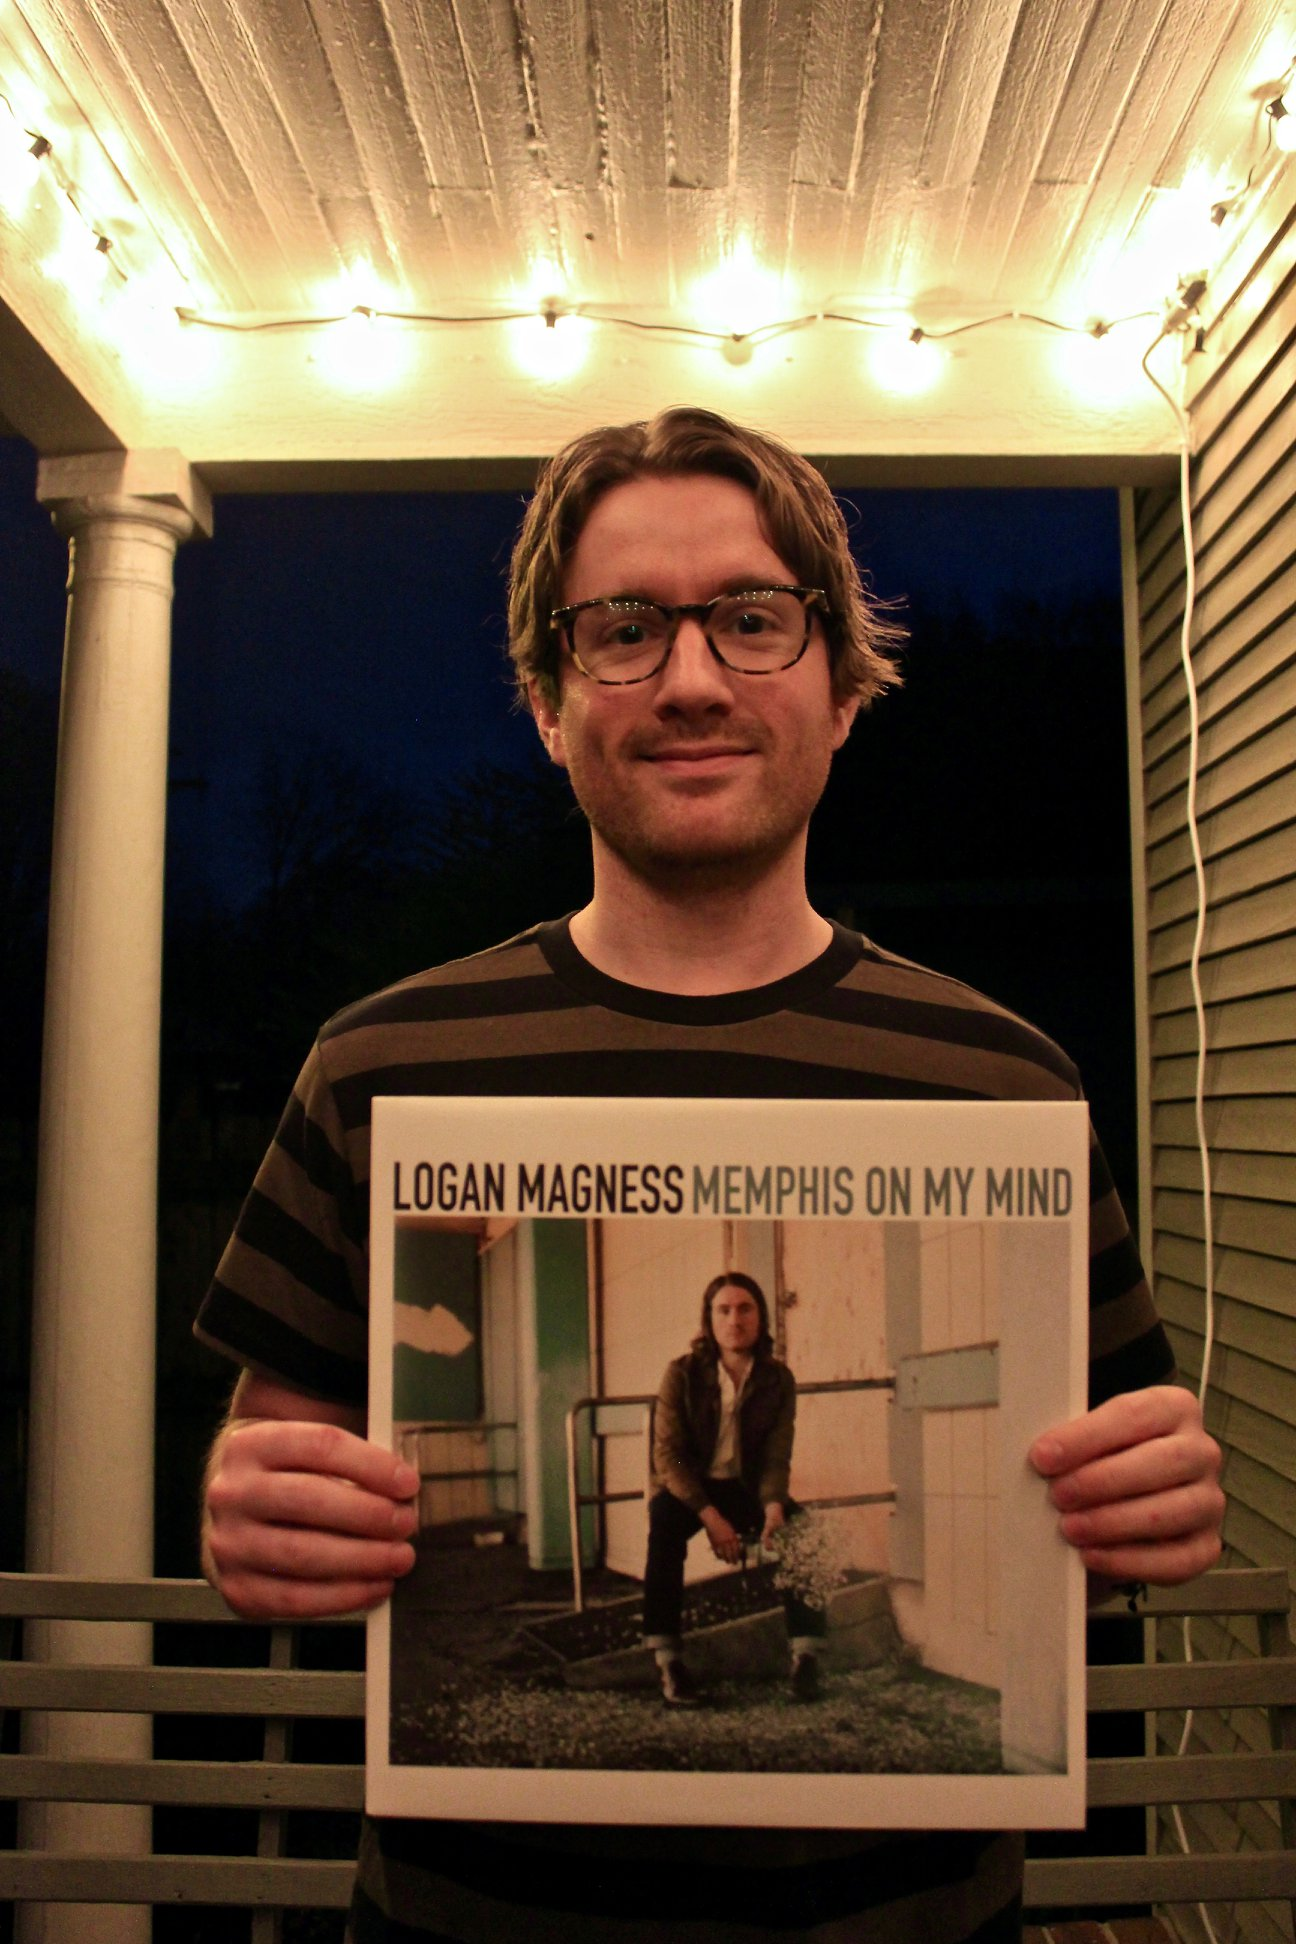 Logan Magness — August 12, 2018 — Red Light Café, Atlanta, GA